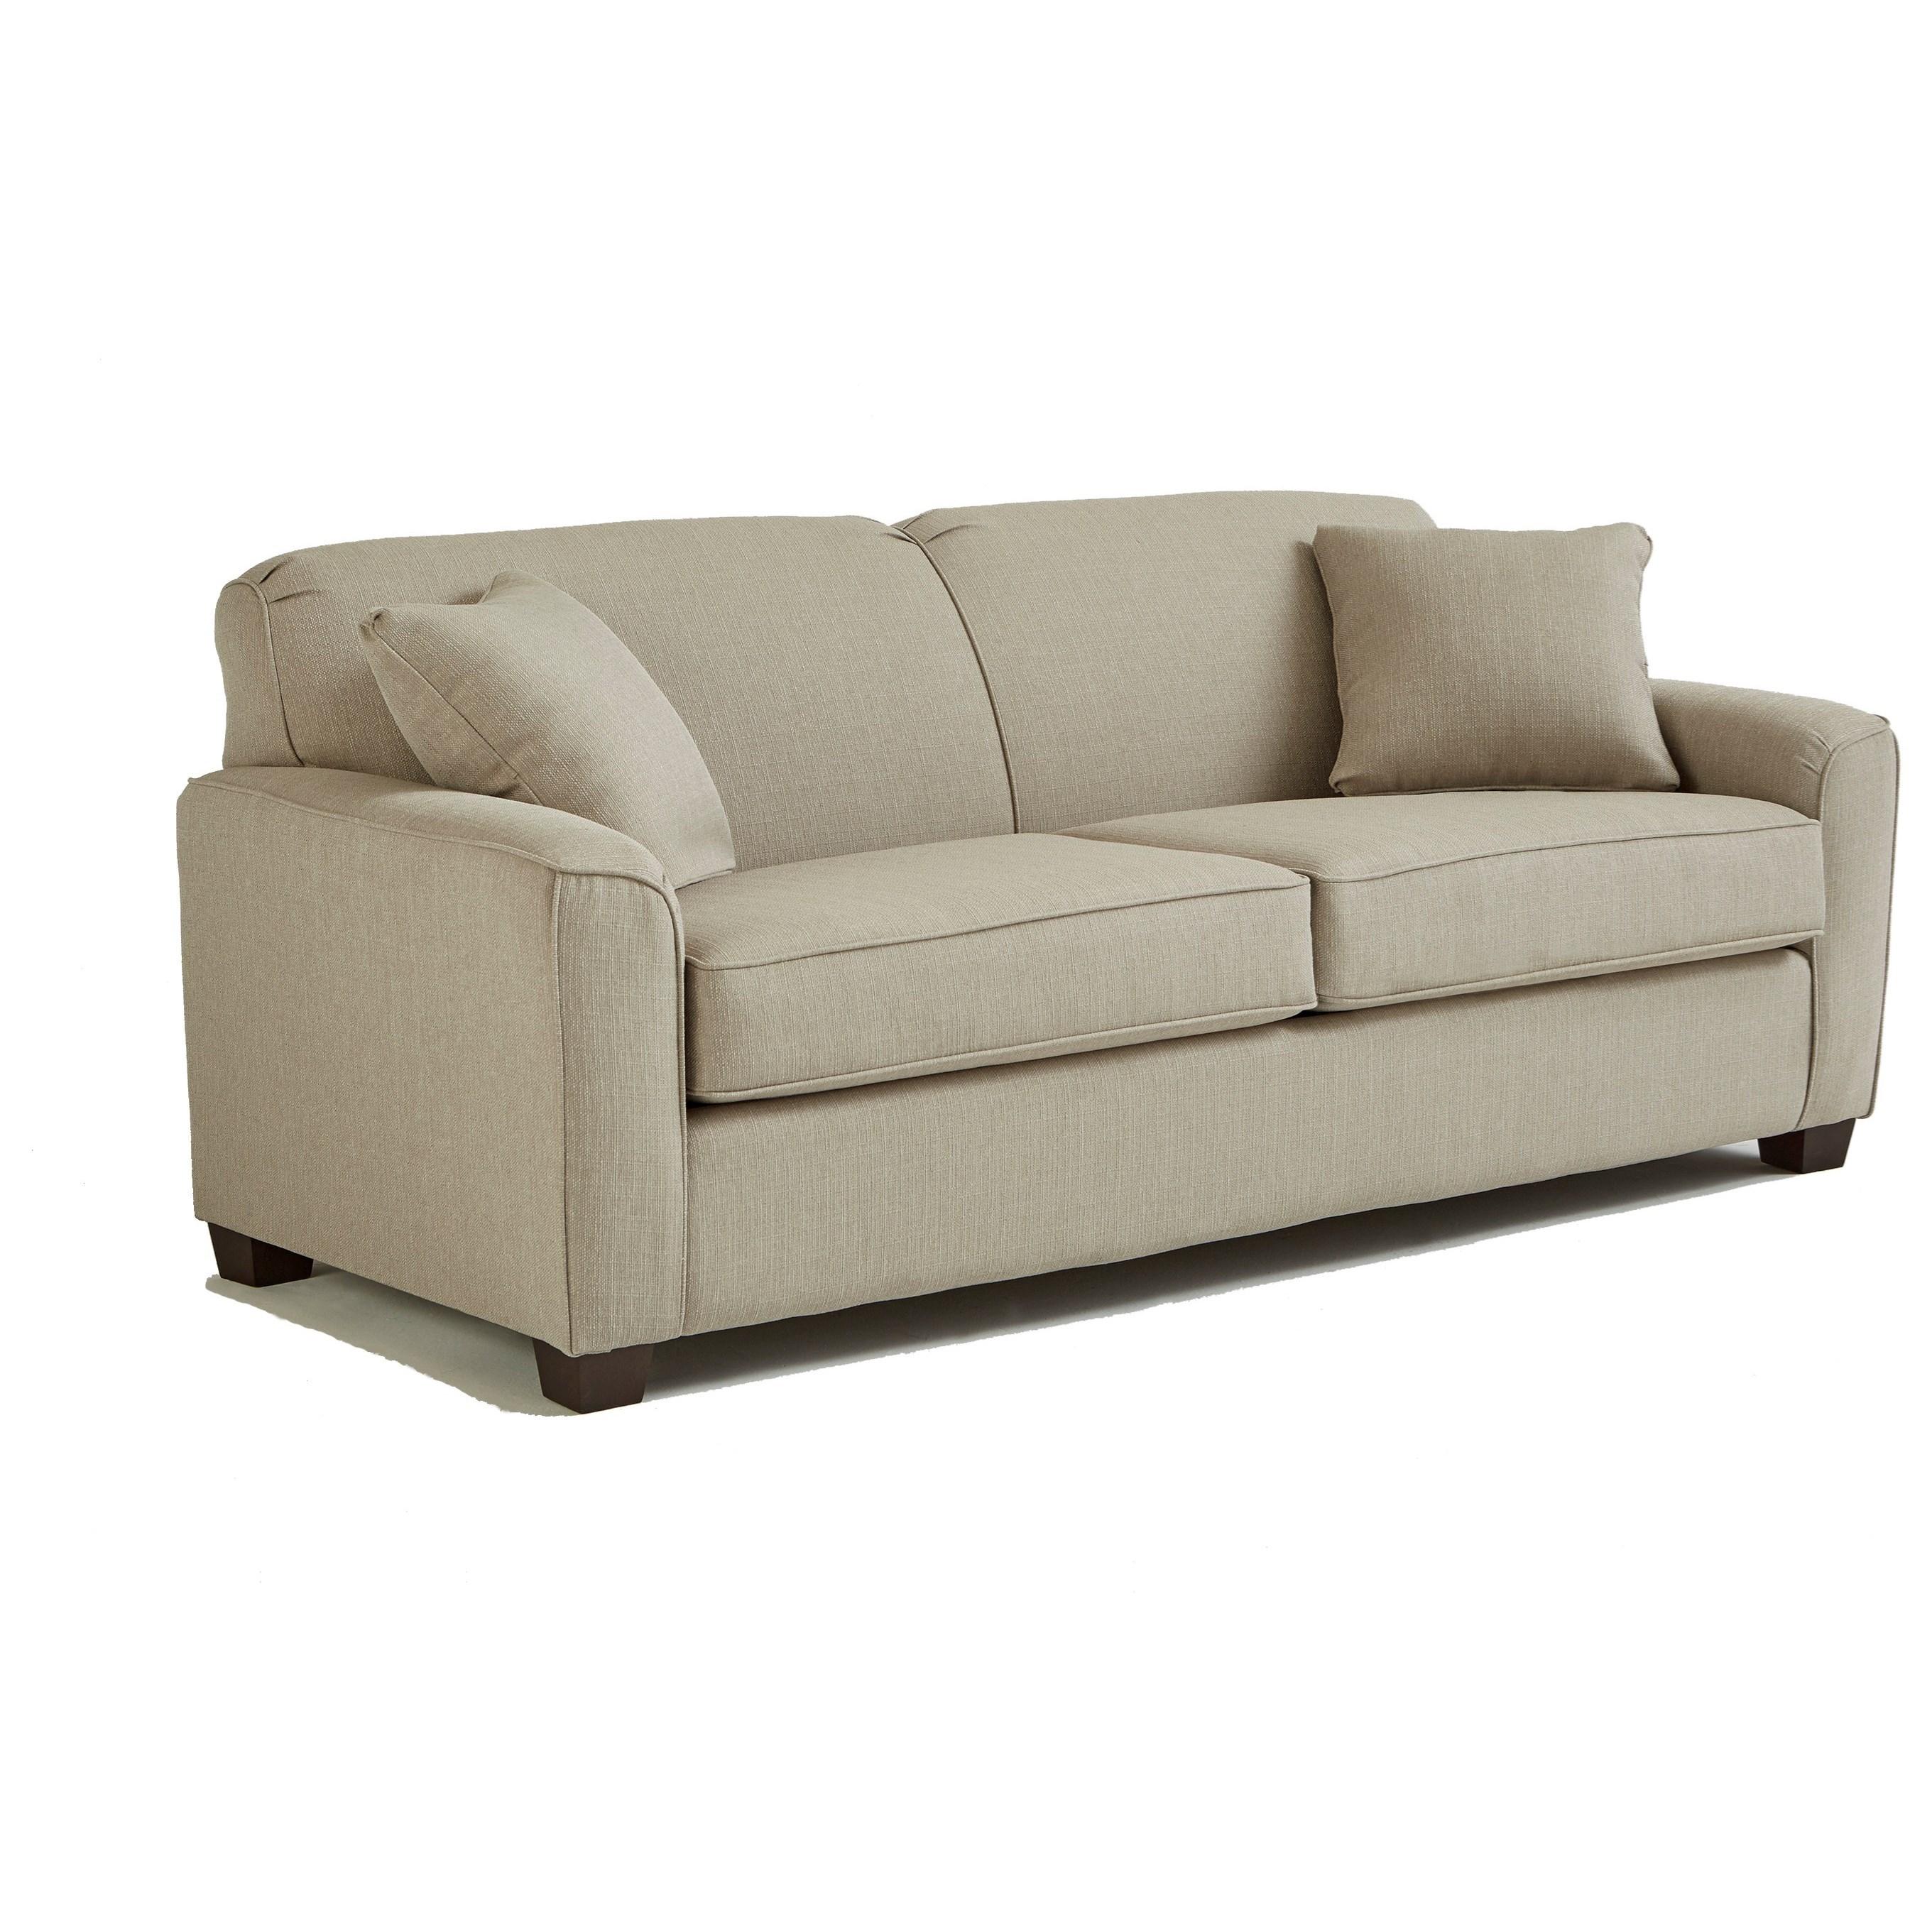 Dinah Queen Sofa Sleeper by Best Home Furnishings at Lapeer Furniture & Mattress Center